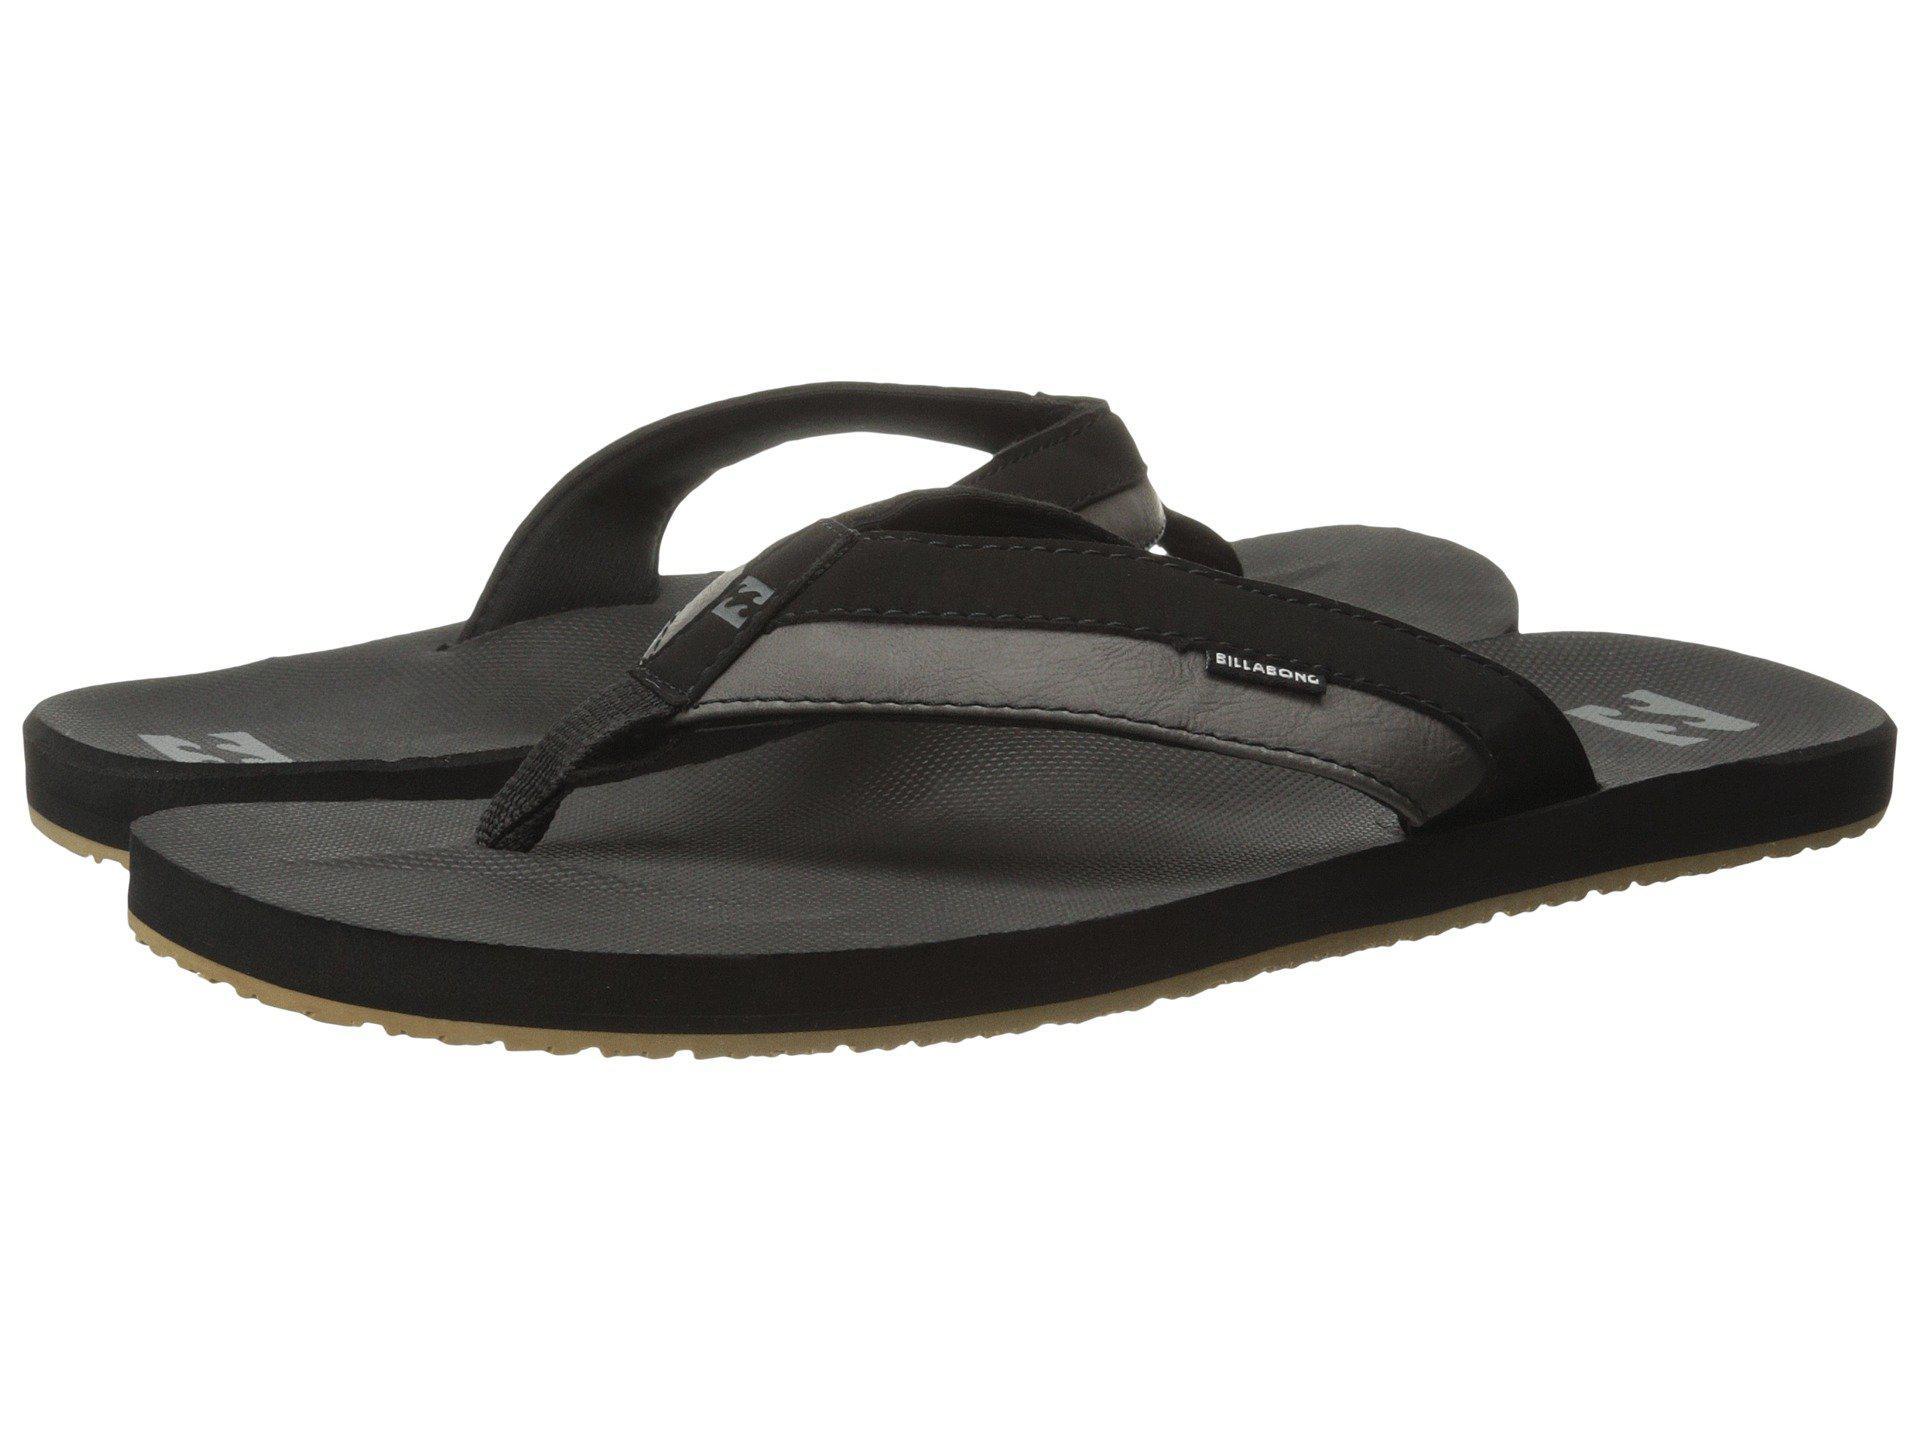 71d7b2d82 Billabong - All Day Impact Sandal (black) Men s Sandals for Men - Lyst.  View fullscreen